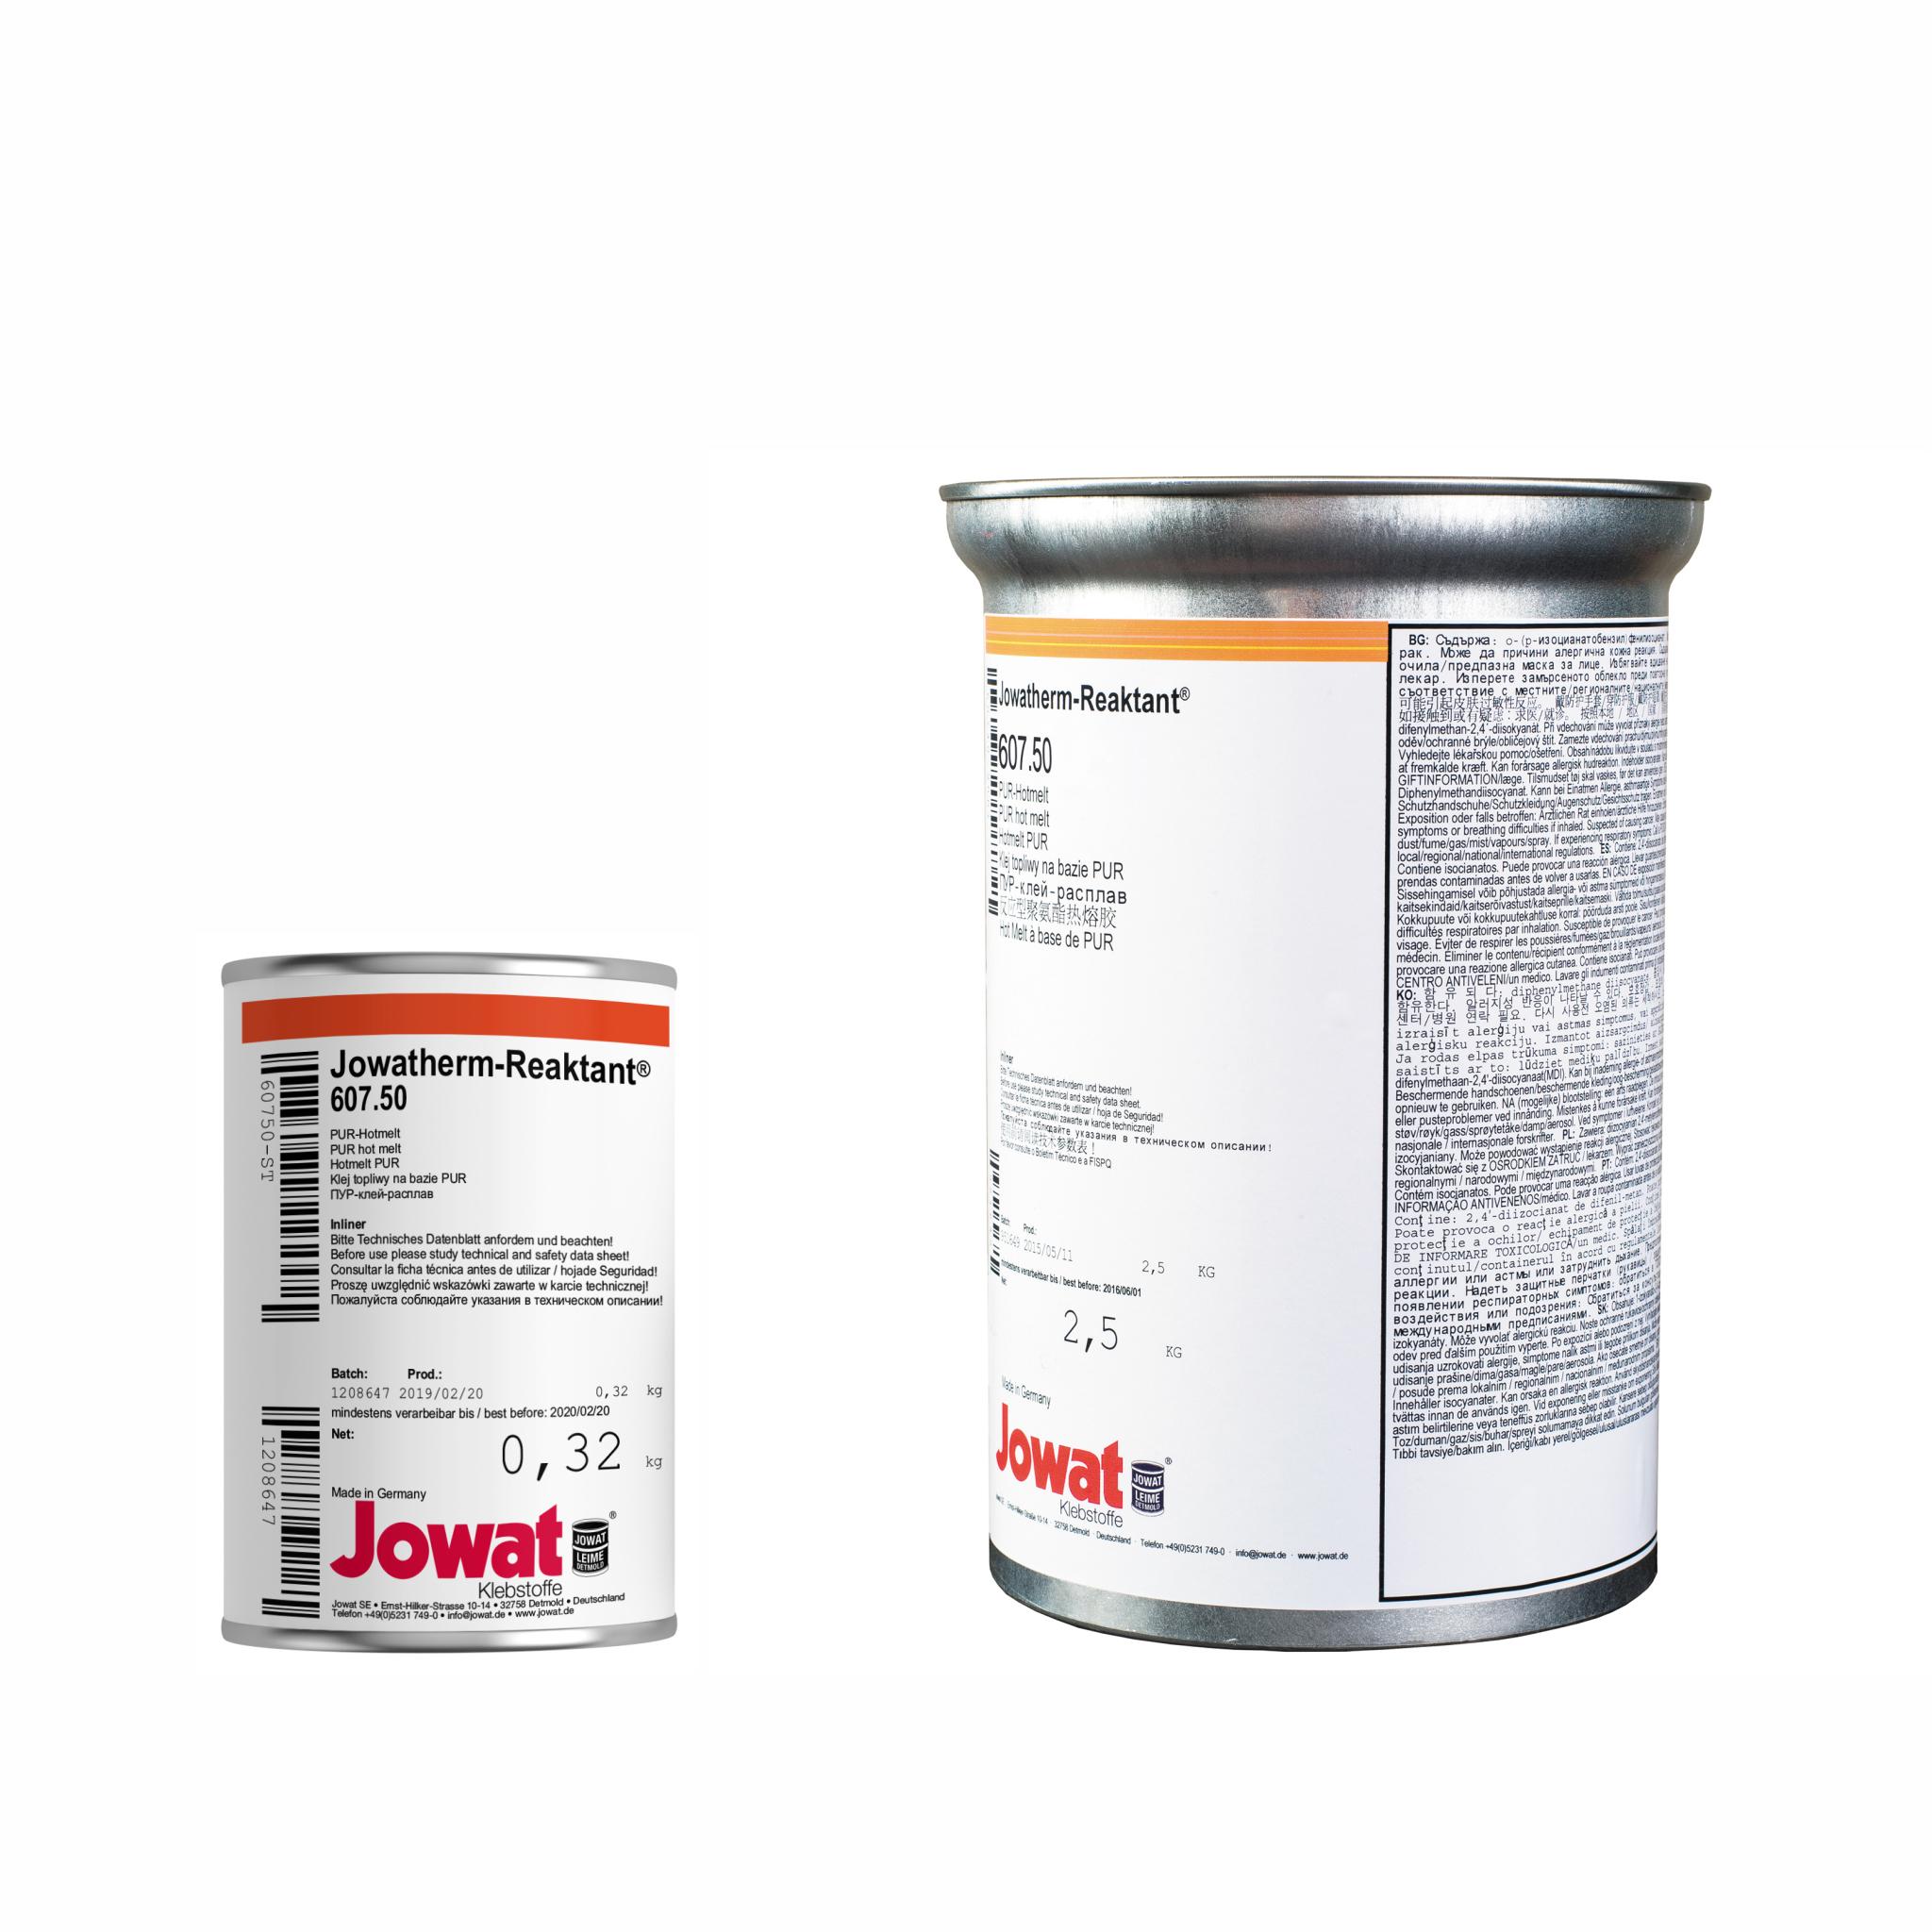 JOWATHERM 607.50 naturel - PUR smeltlijm